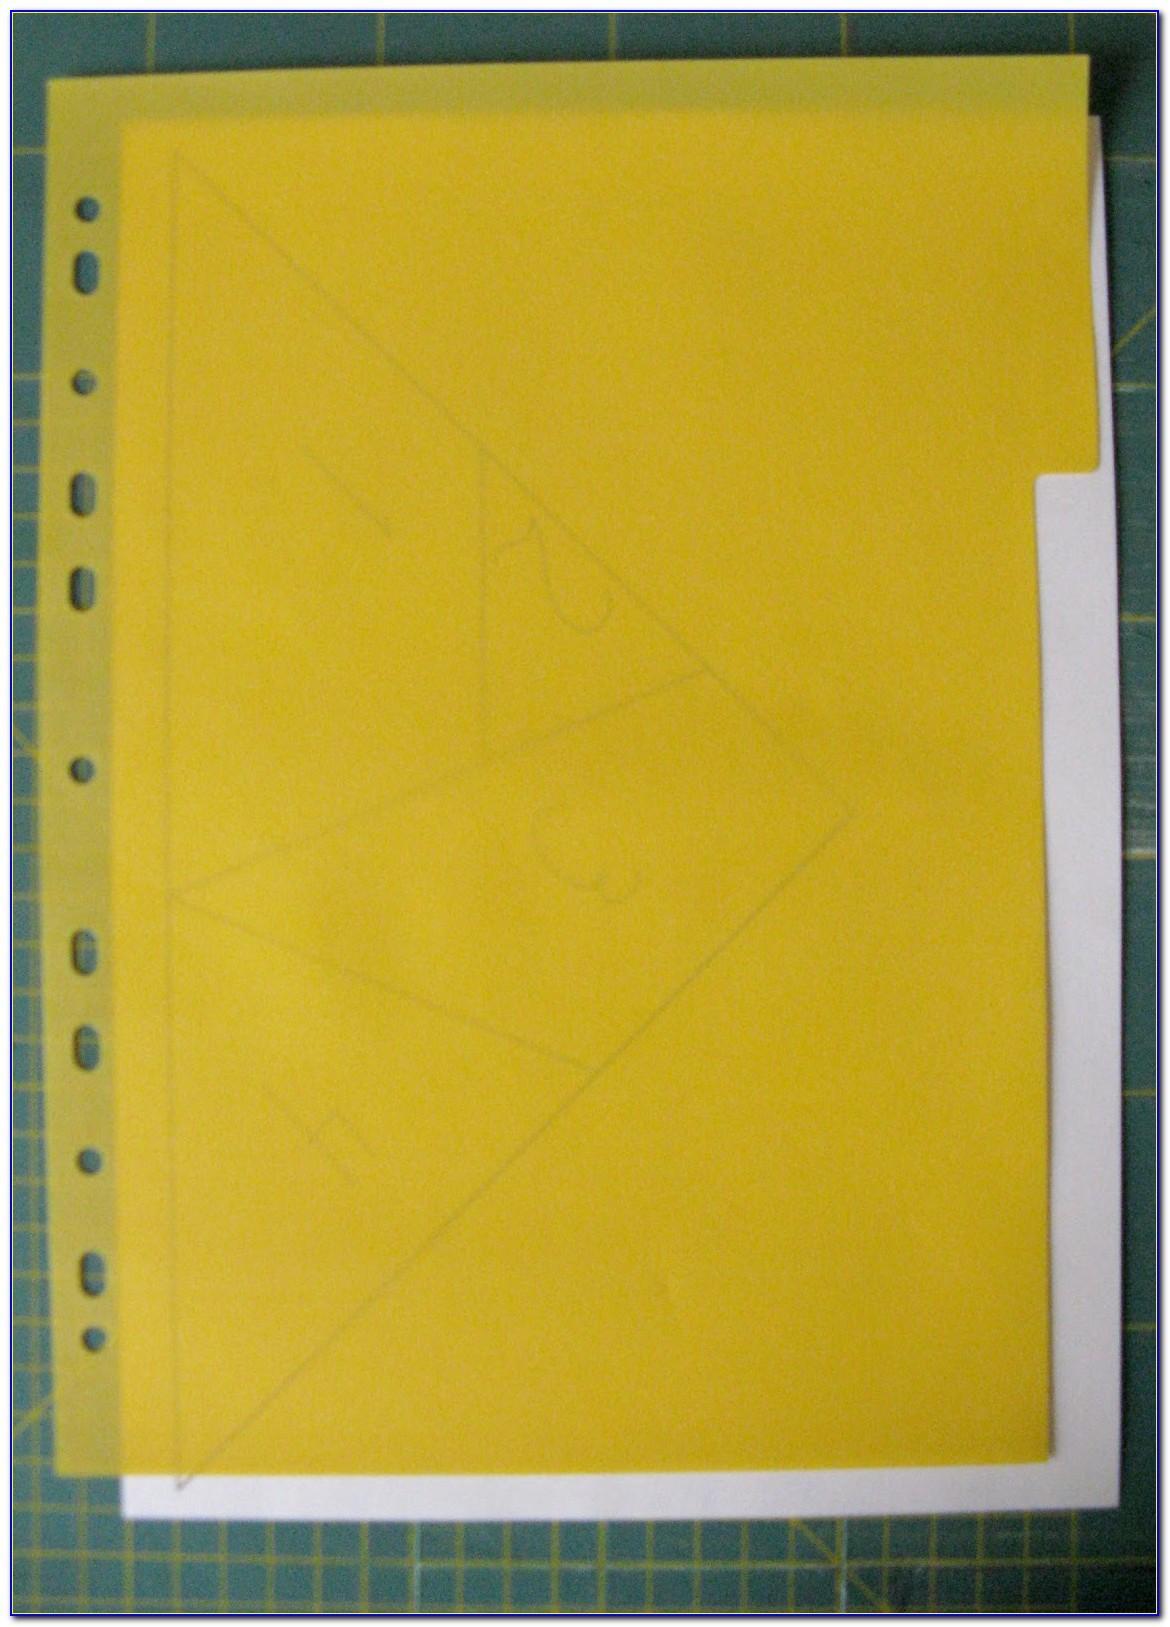 Hanging Folder Tab Template Excel